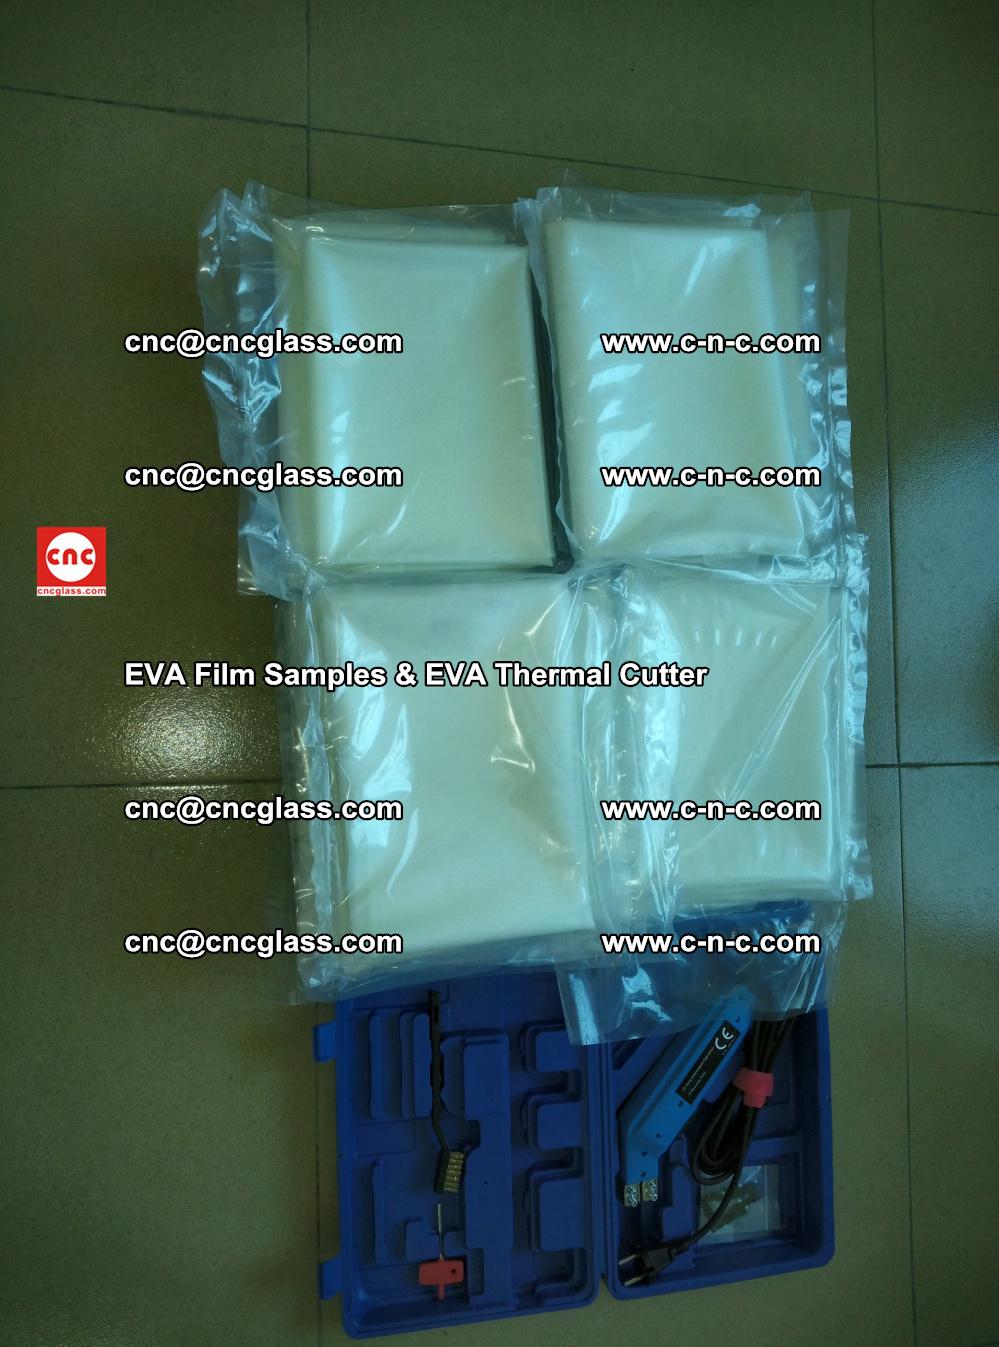 EVAFORCE SUPER CLEAR EVA Film Samples and EVA Thermal Cutter (39)